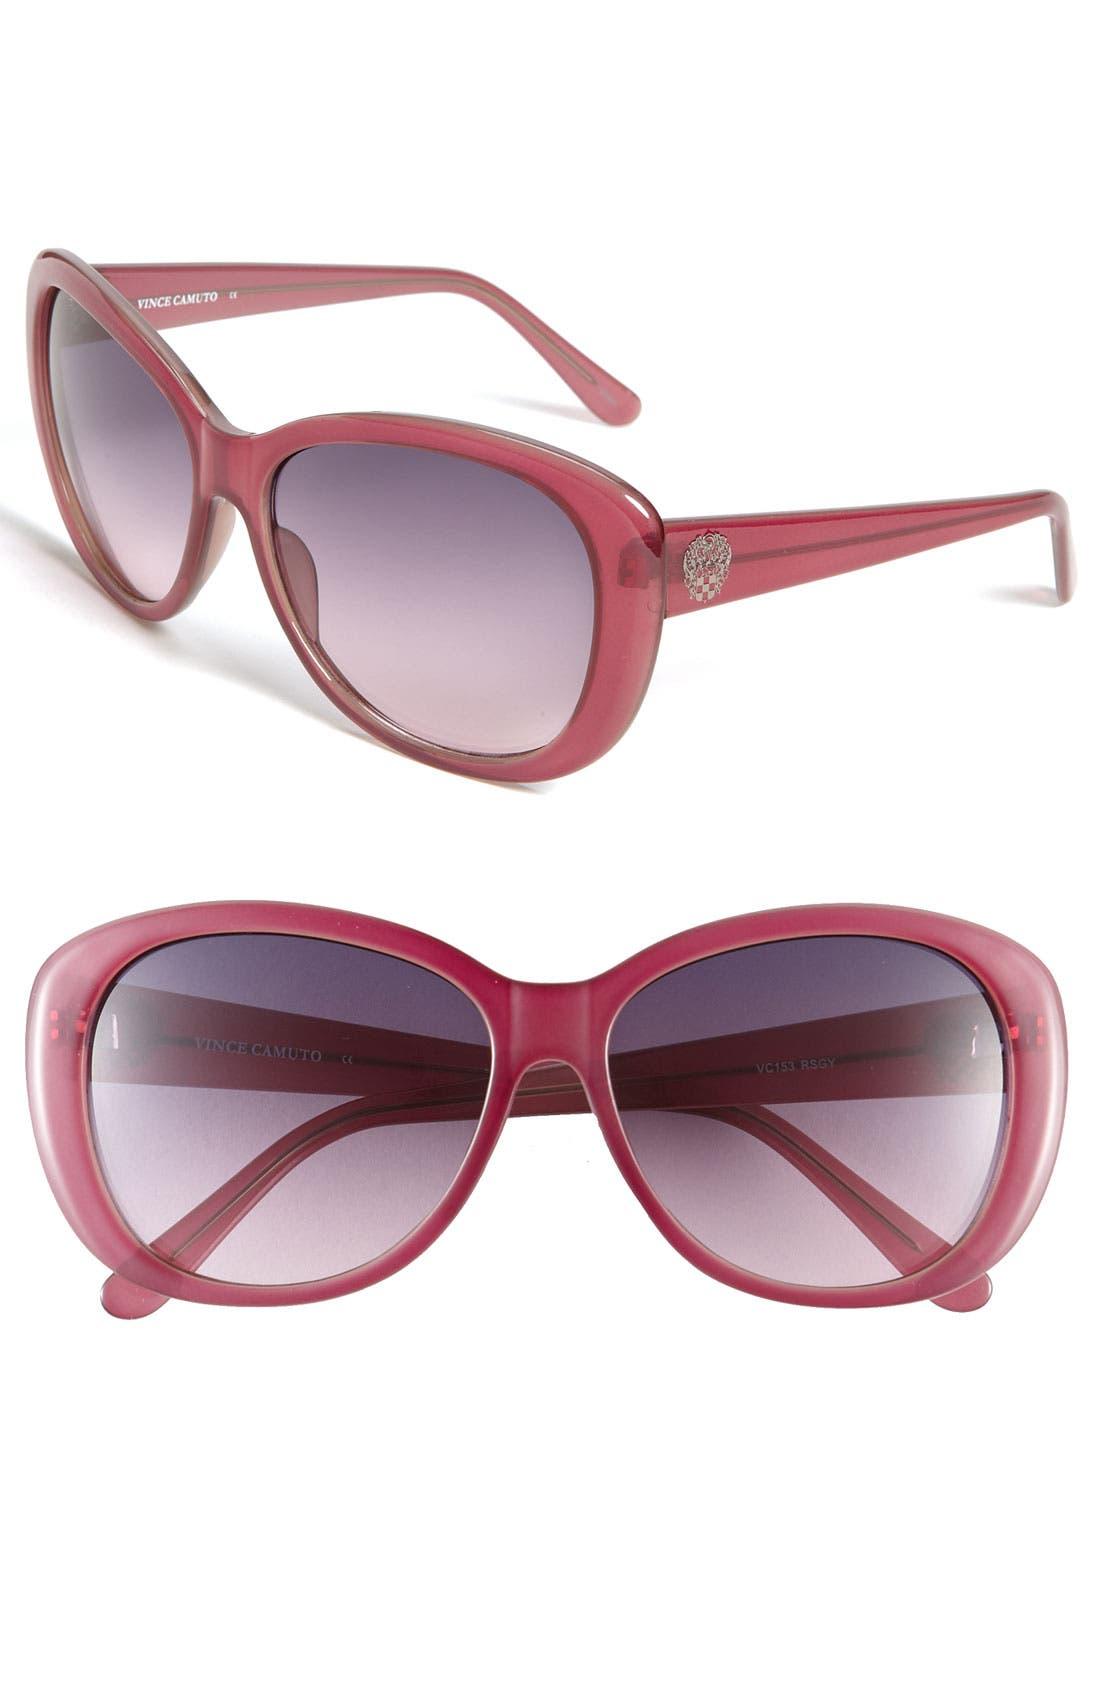 Main Image - Vince Camuto Plastic Sunglasses